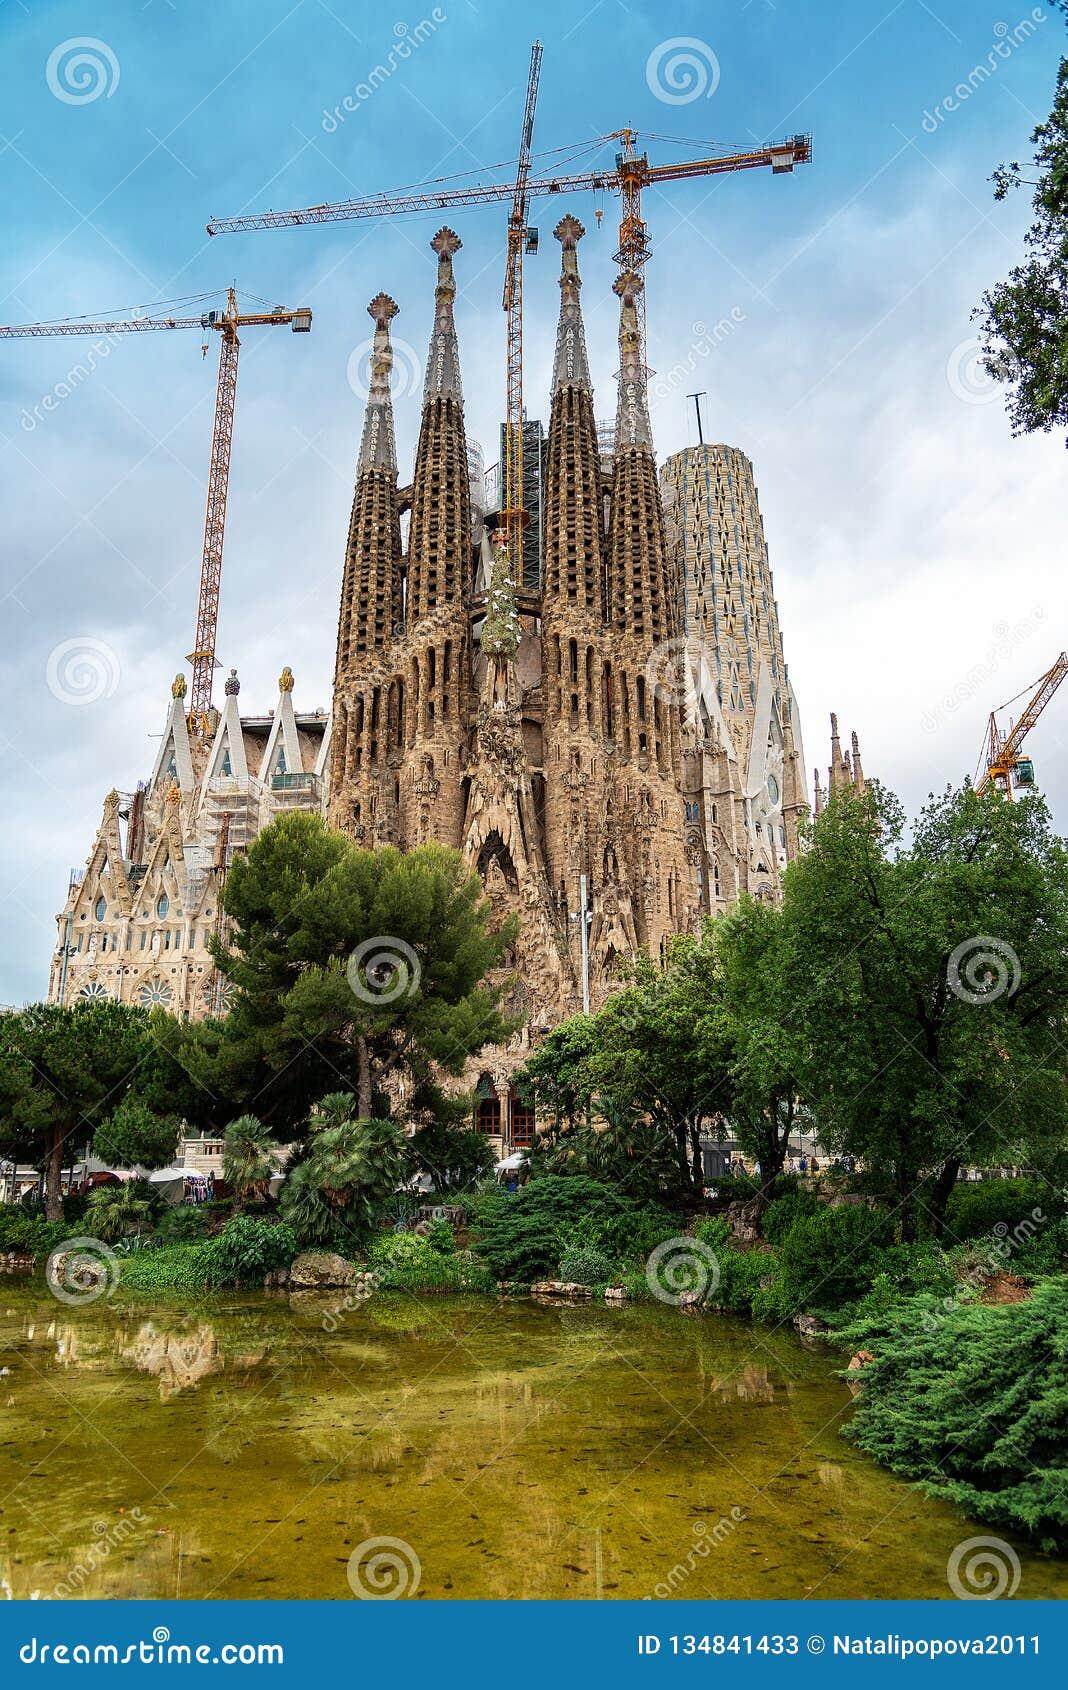 The Cathedral of La Sagrada Familia by the architect Antonio Gaudi, Catalonia, Barcelona Spain - May 13, 2018